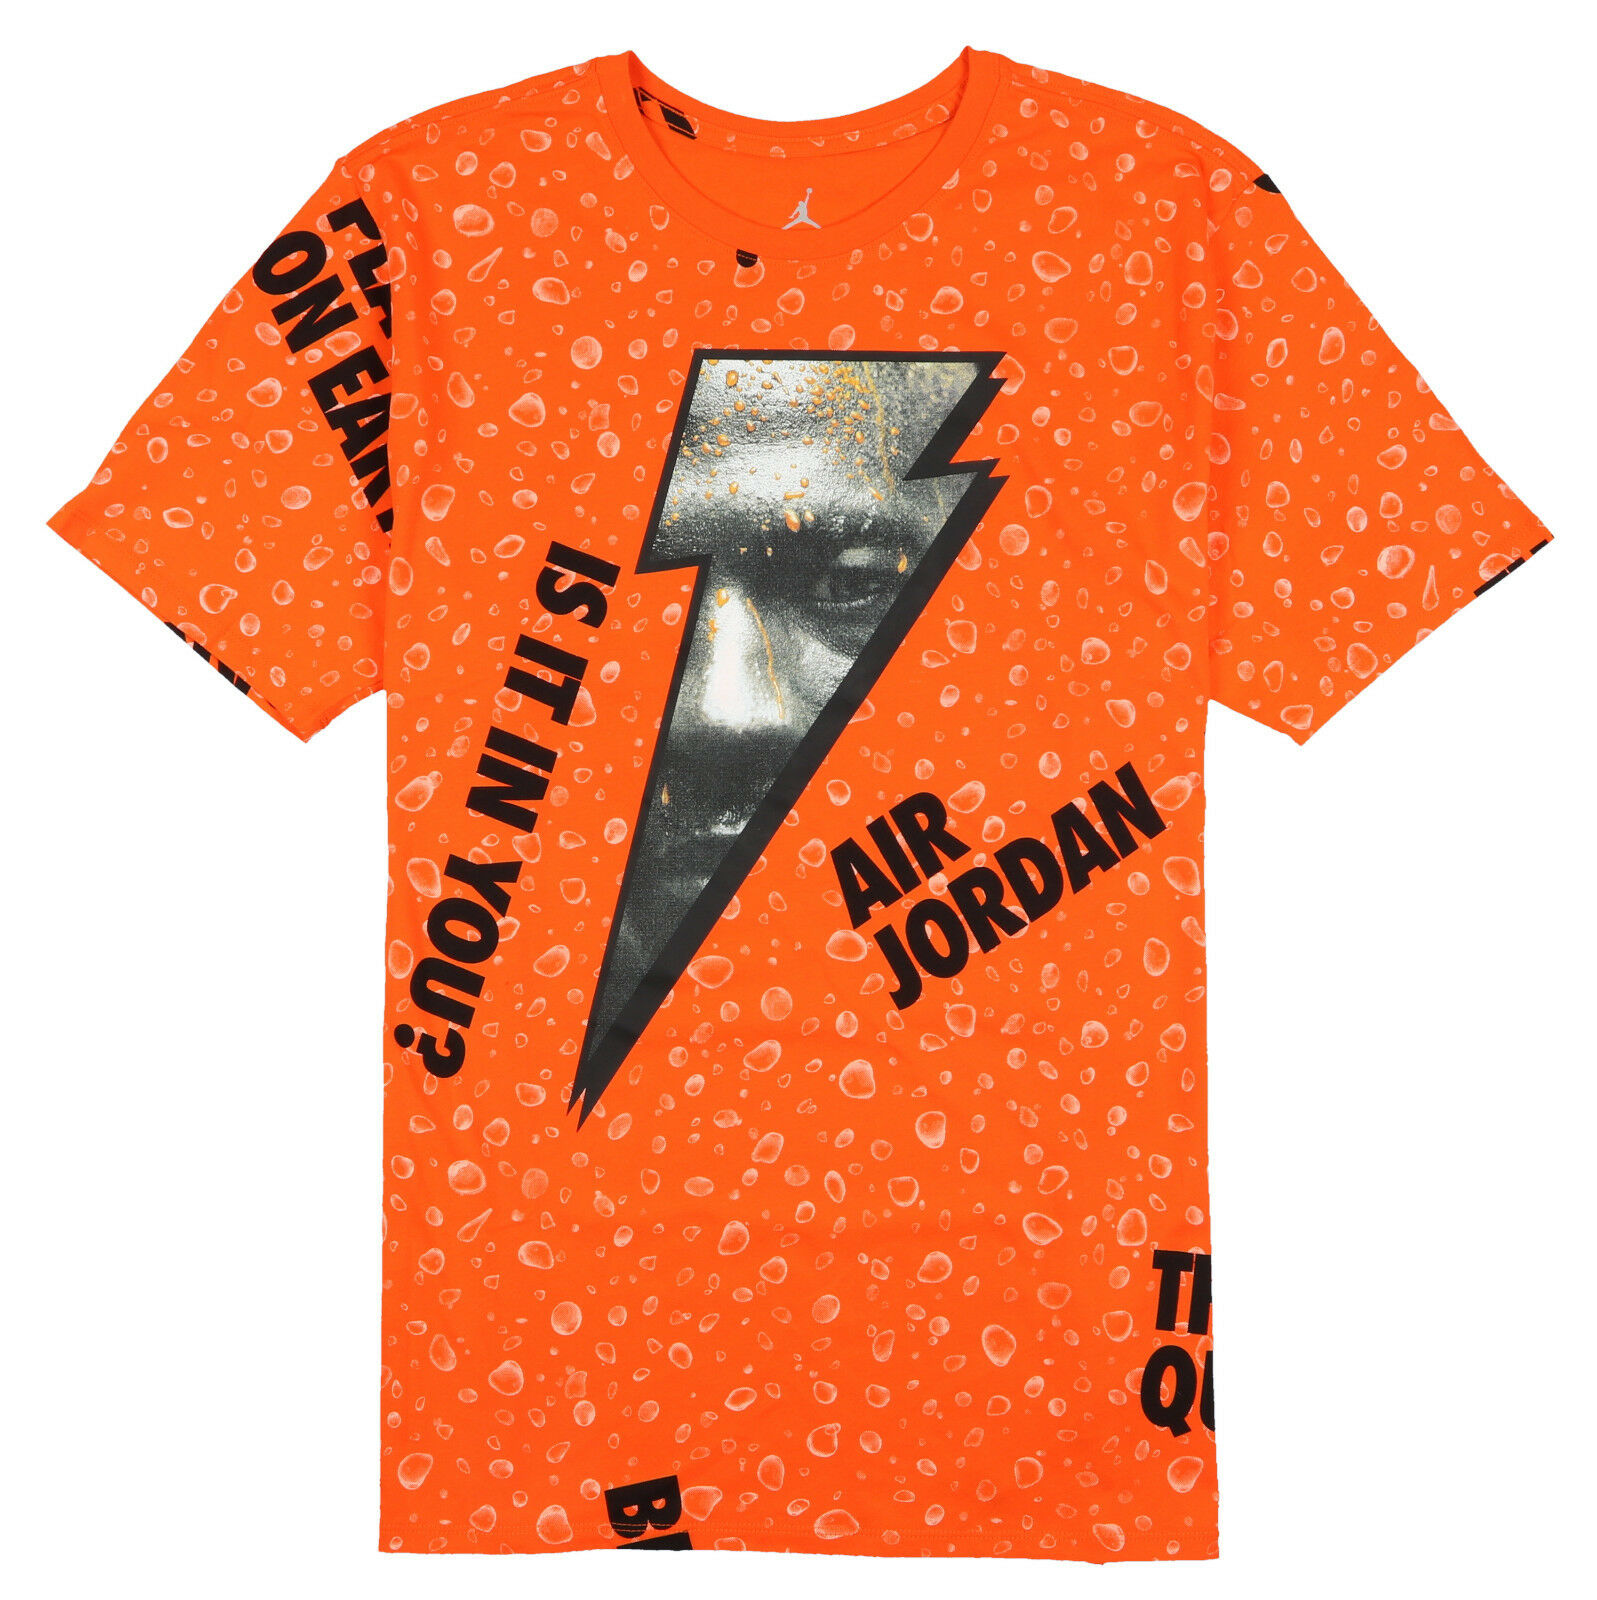 Jordan Retro 1 Be Like Mike Mike Mike Gatorade T-Shirt 3XL Xxx-Large Orange Schwarz Thirst | Viele Stile  2bfa31